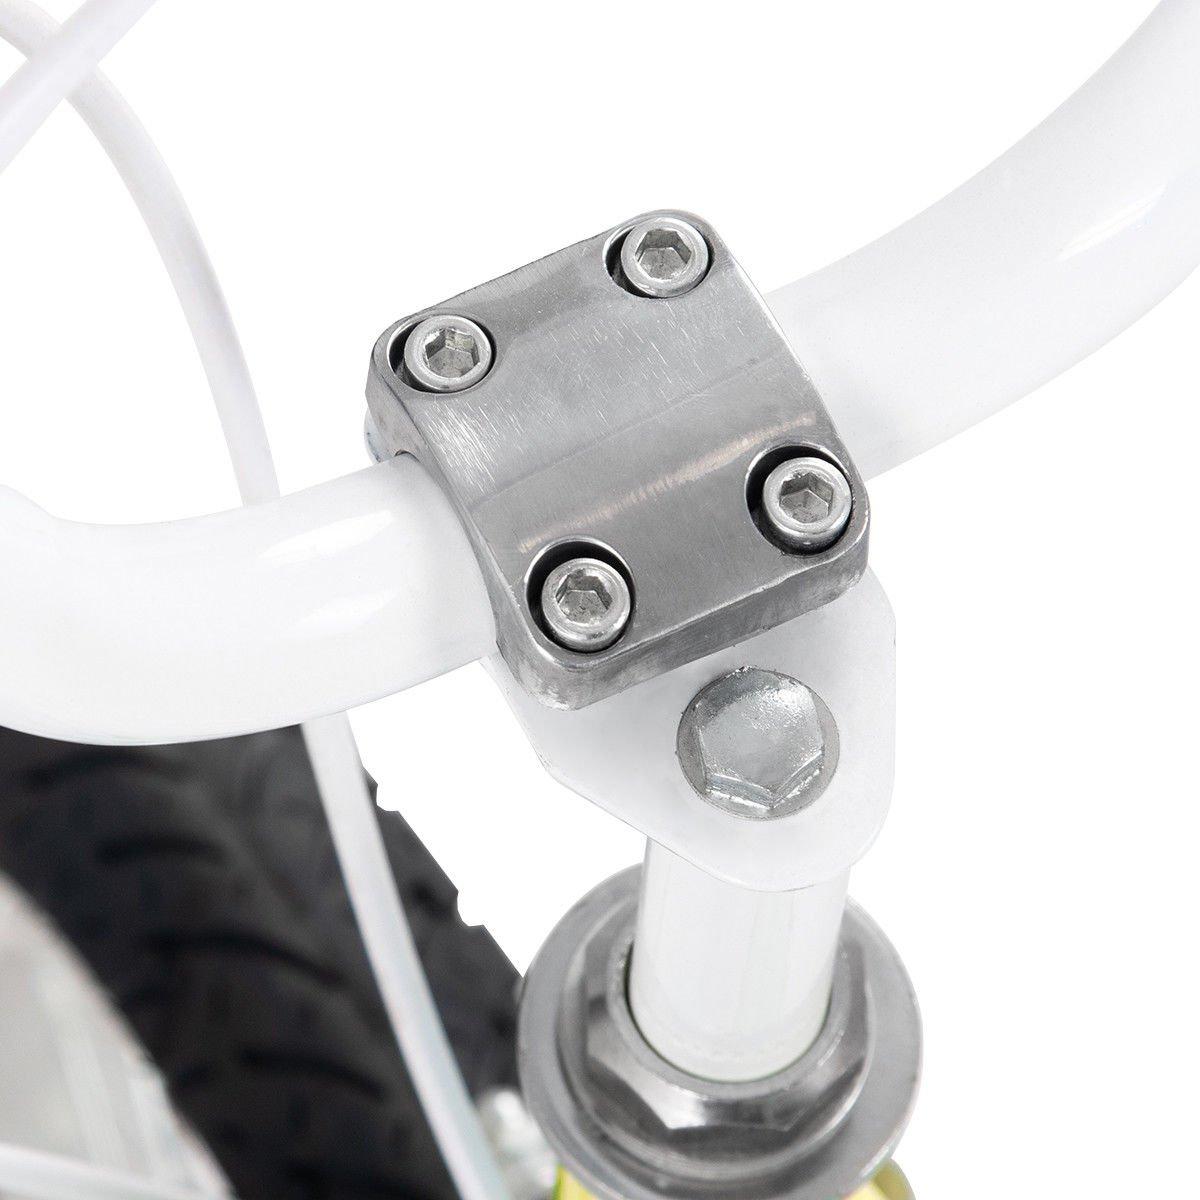 FDInspiration Yellow 45'' x 31.5'' Metal Frame Kids Bike w/Training Wheels with Ebook by FDInspiration (Image #7)